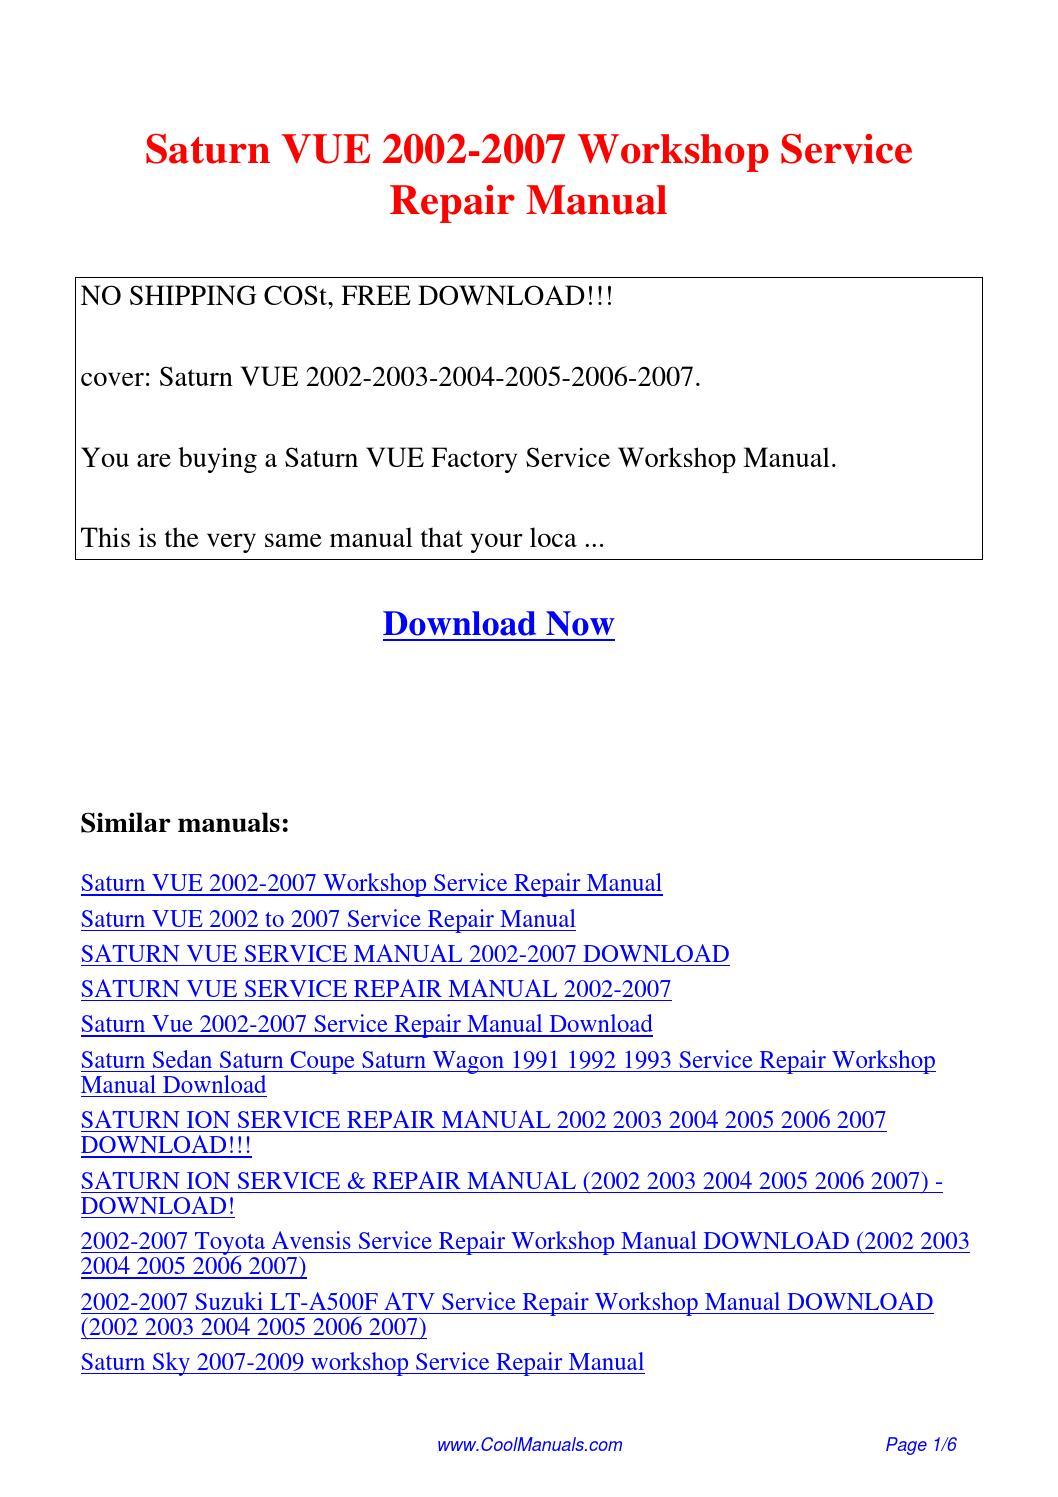 Saturn VUE 2002-2007 Workshop Service Repair Manual.pdf by Guang Hui - issuu